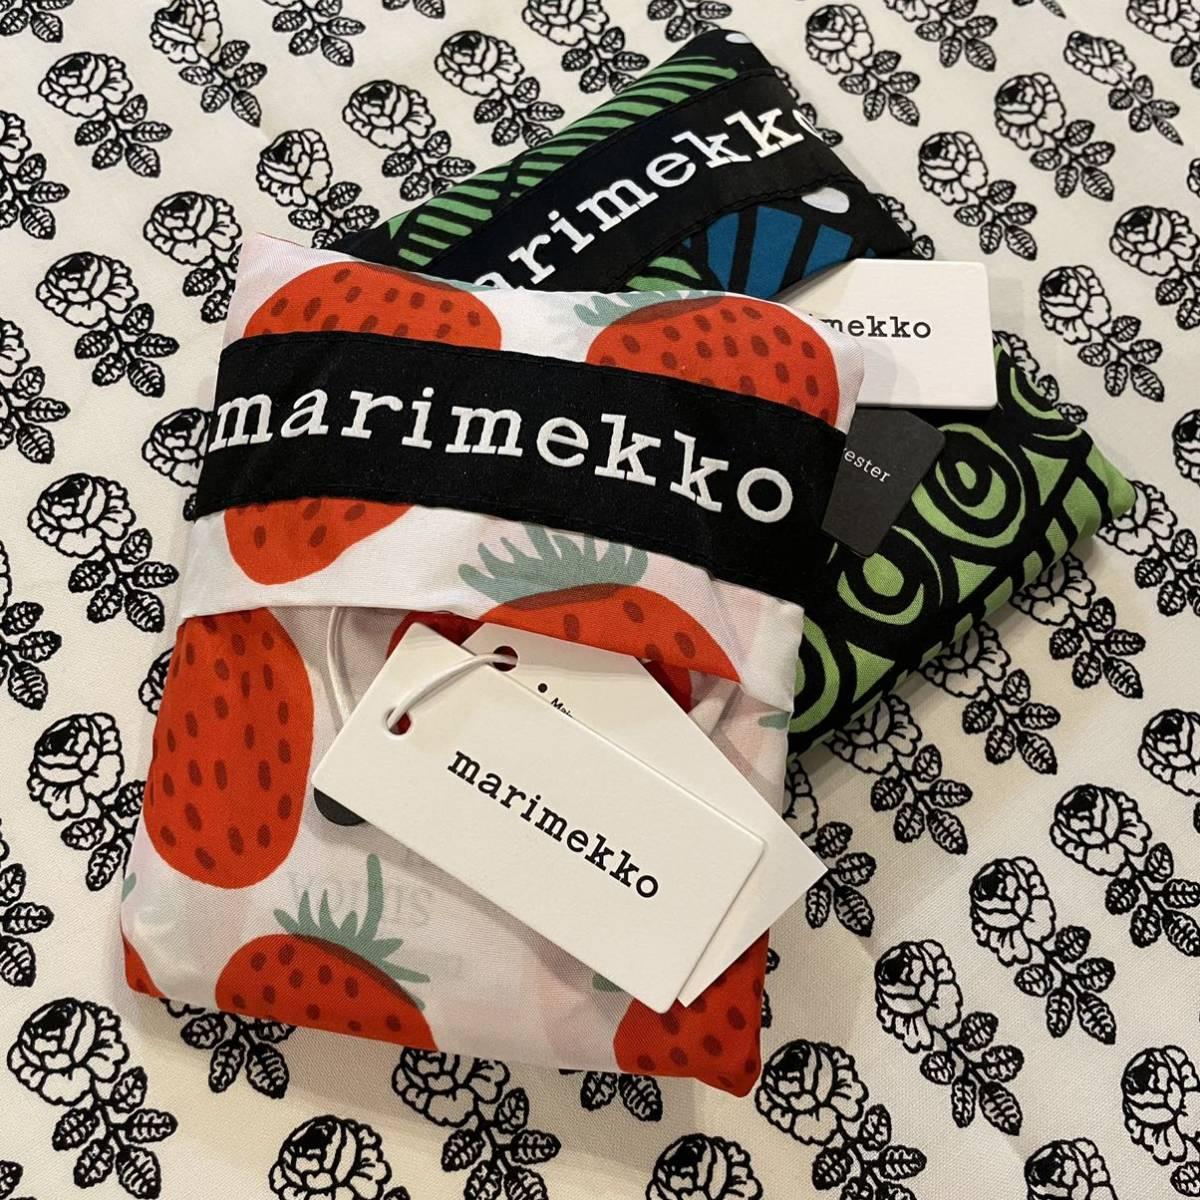 marimekko マリメッコ 新発売マンシッカ スマートバッグ2種 新品送料込_画像7